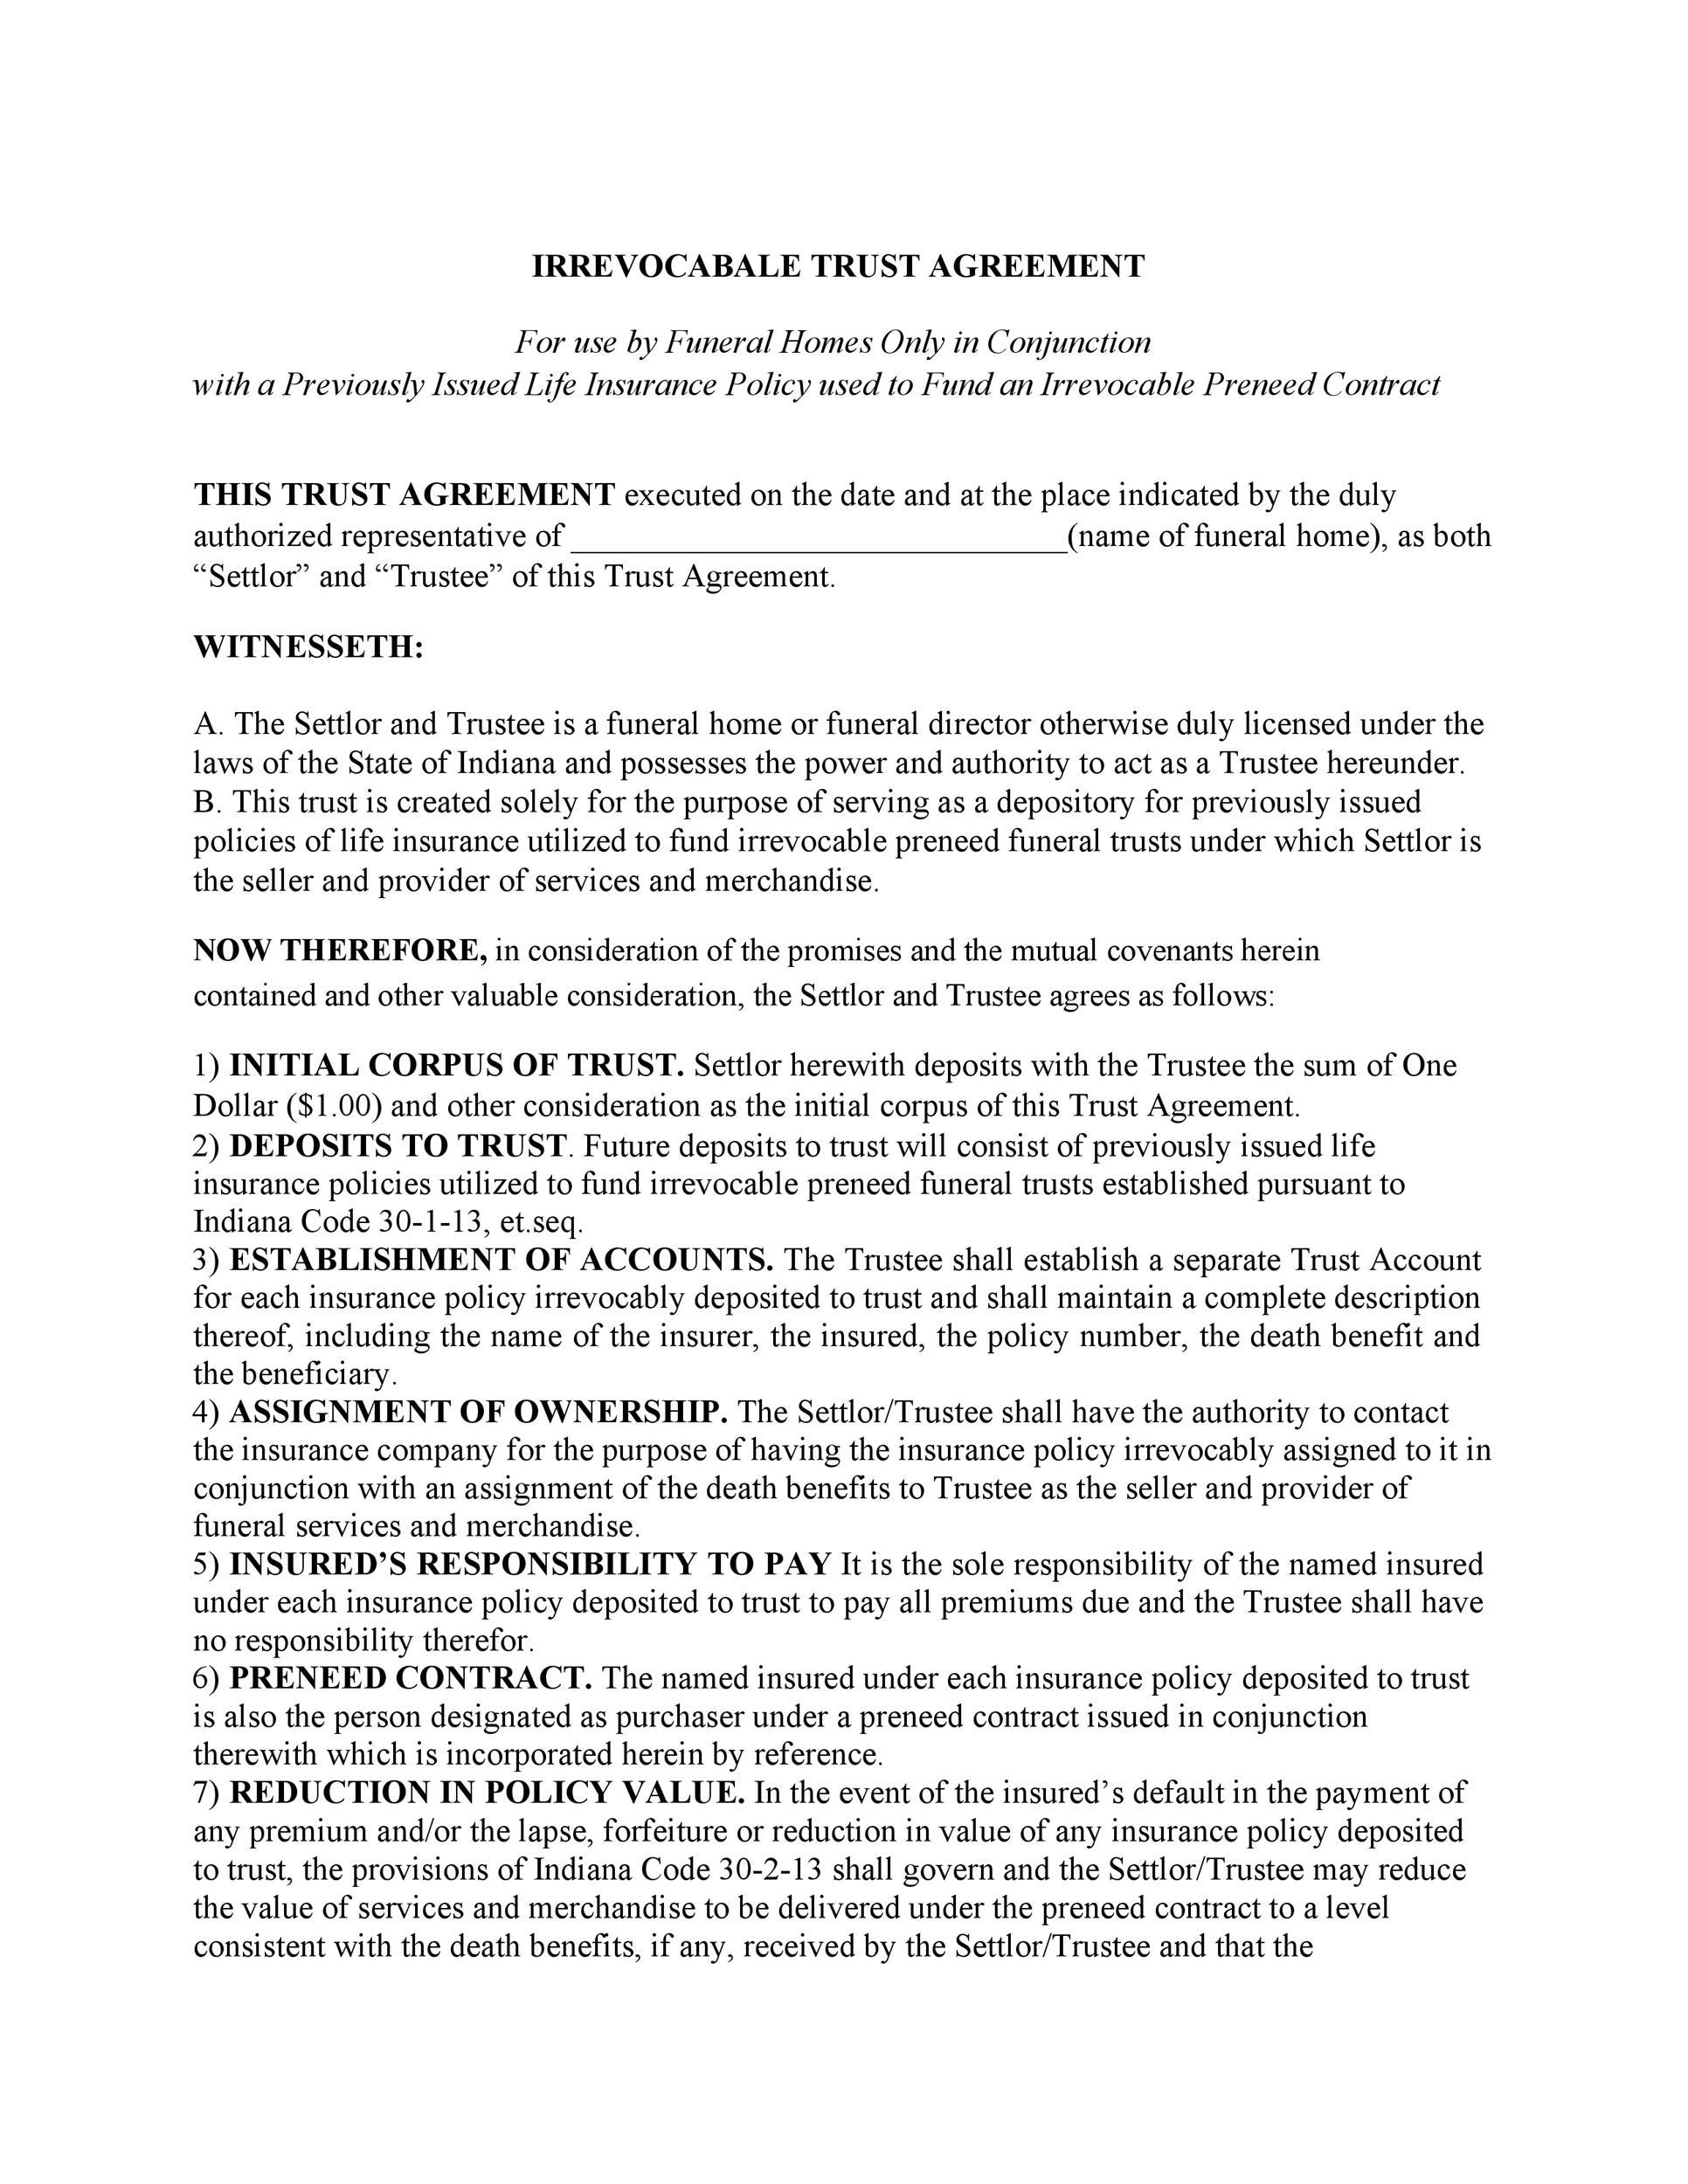 Free trust agreement 48